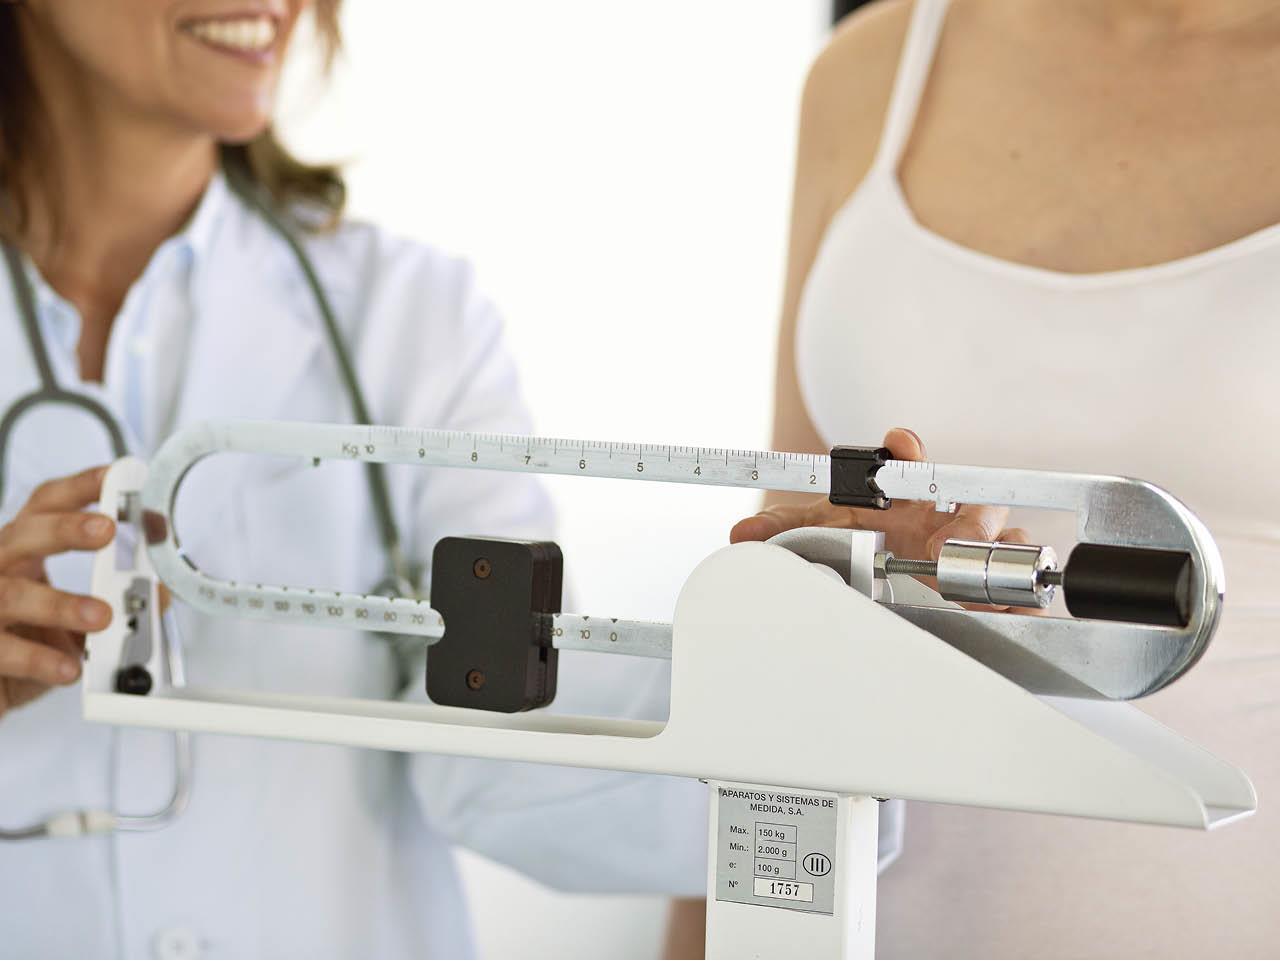 Dieta de proteinas para adelgazar 10 kilos en un mes